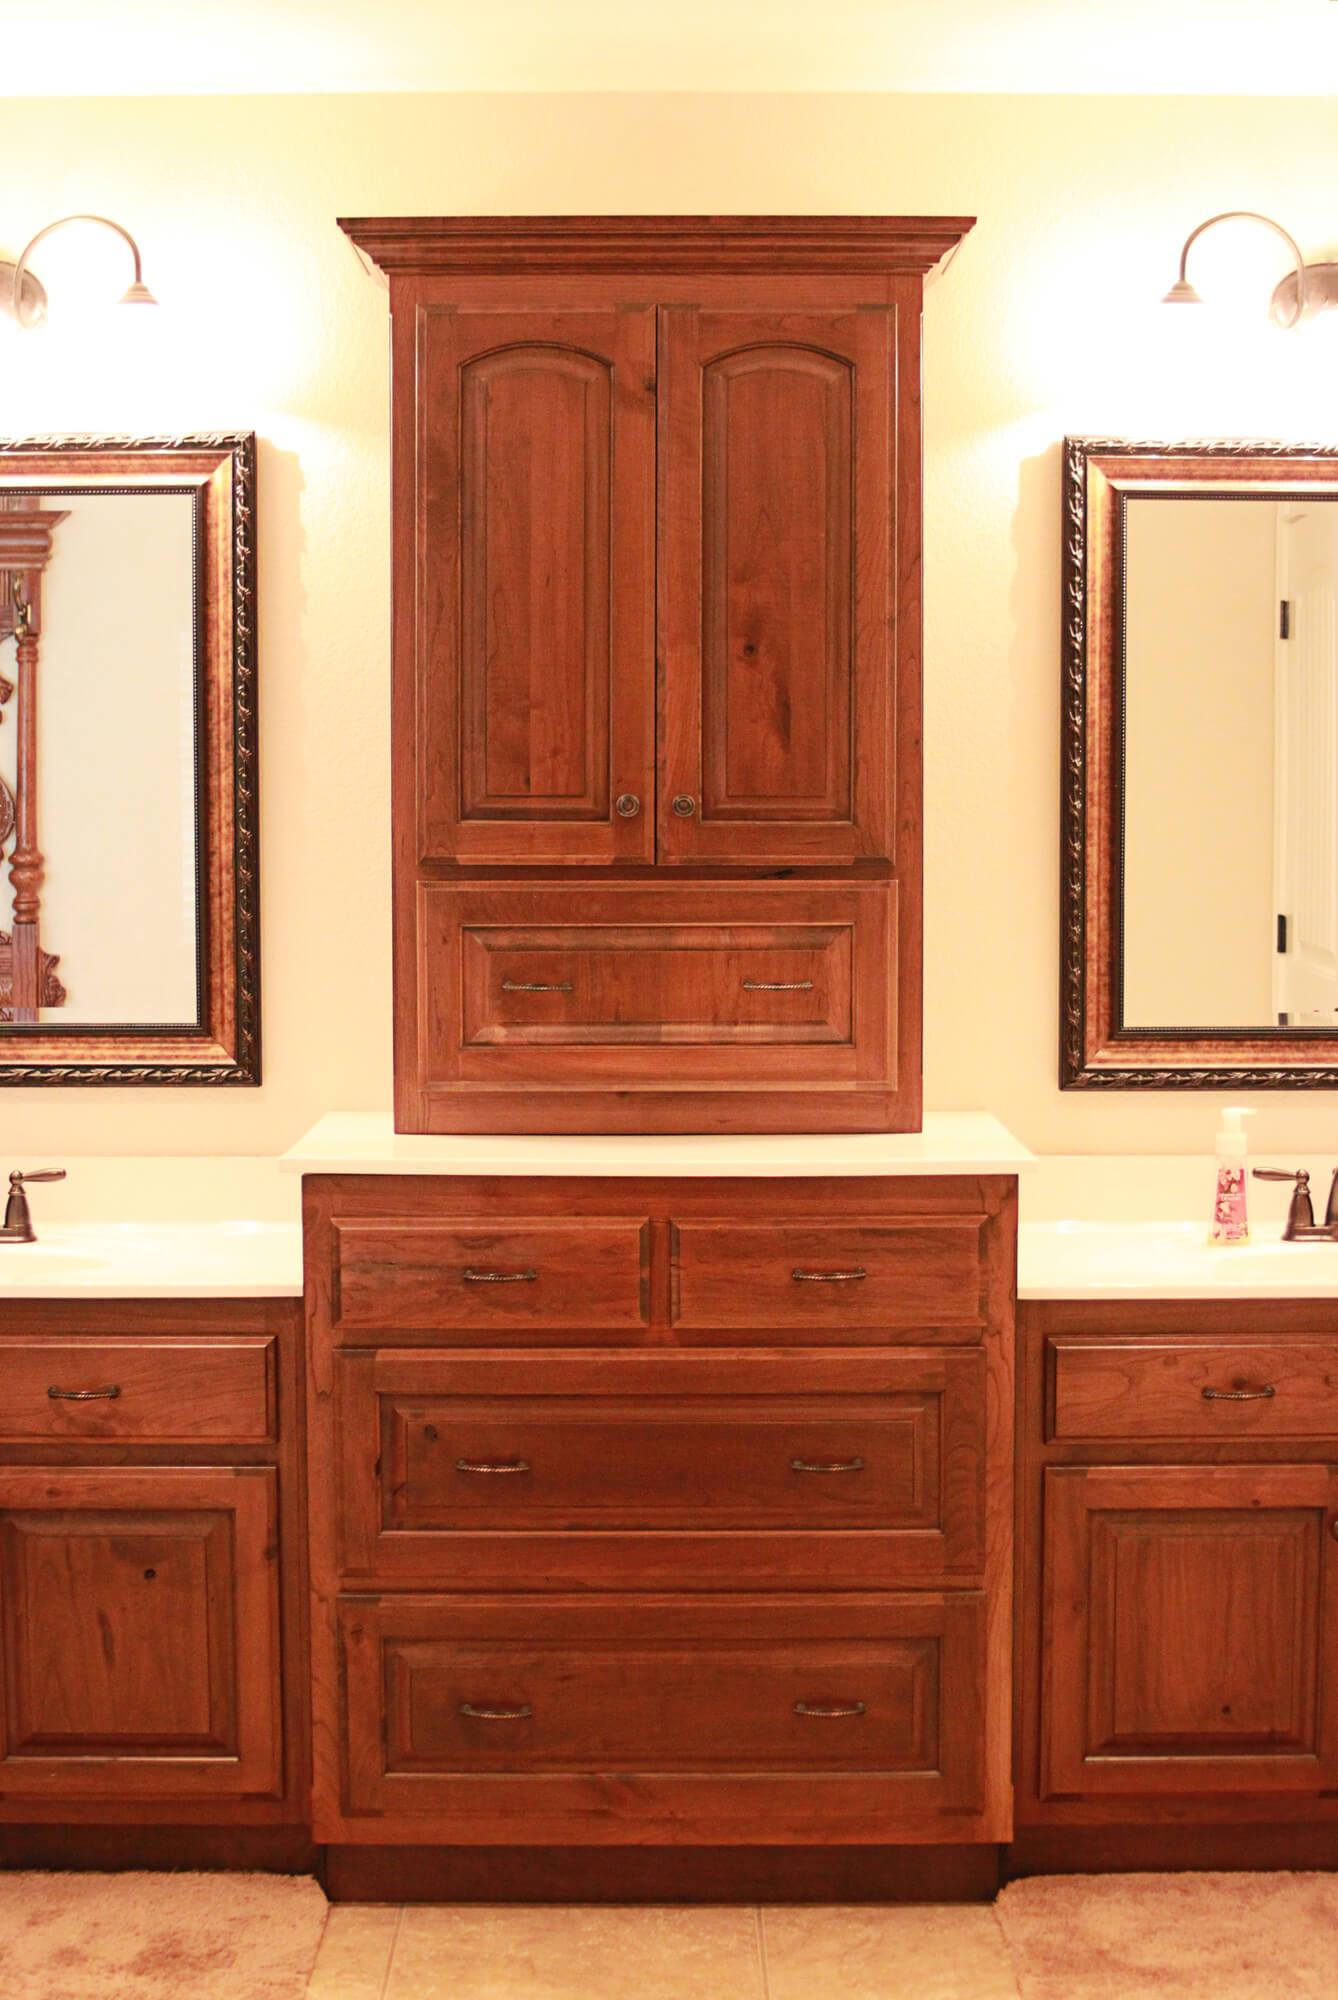 custom-bathroom-cabinet-rustic-cherry-1